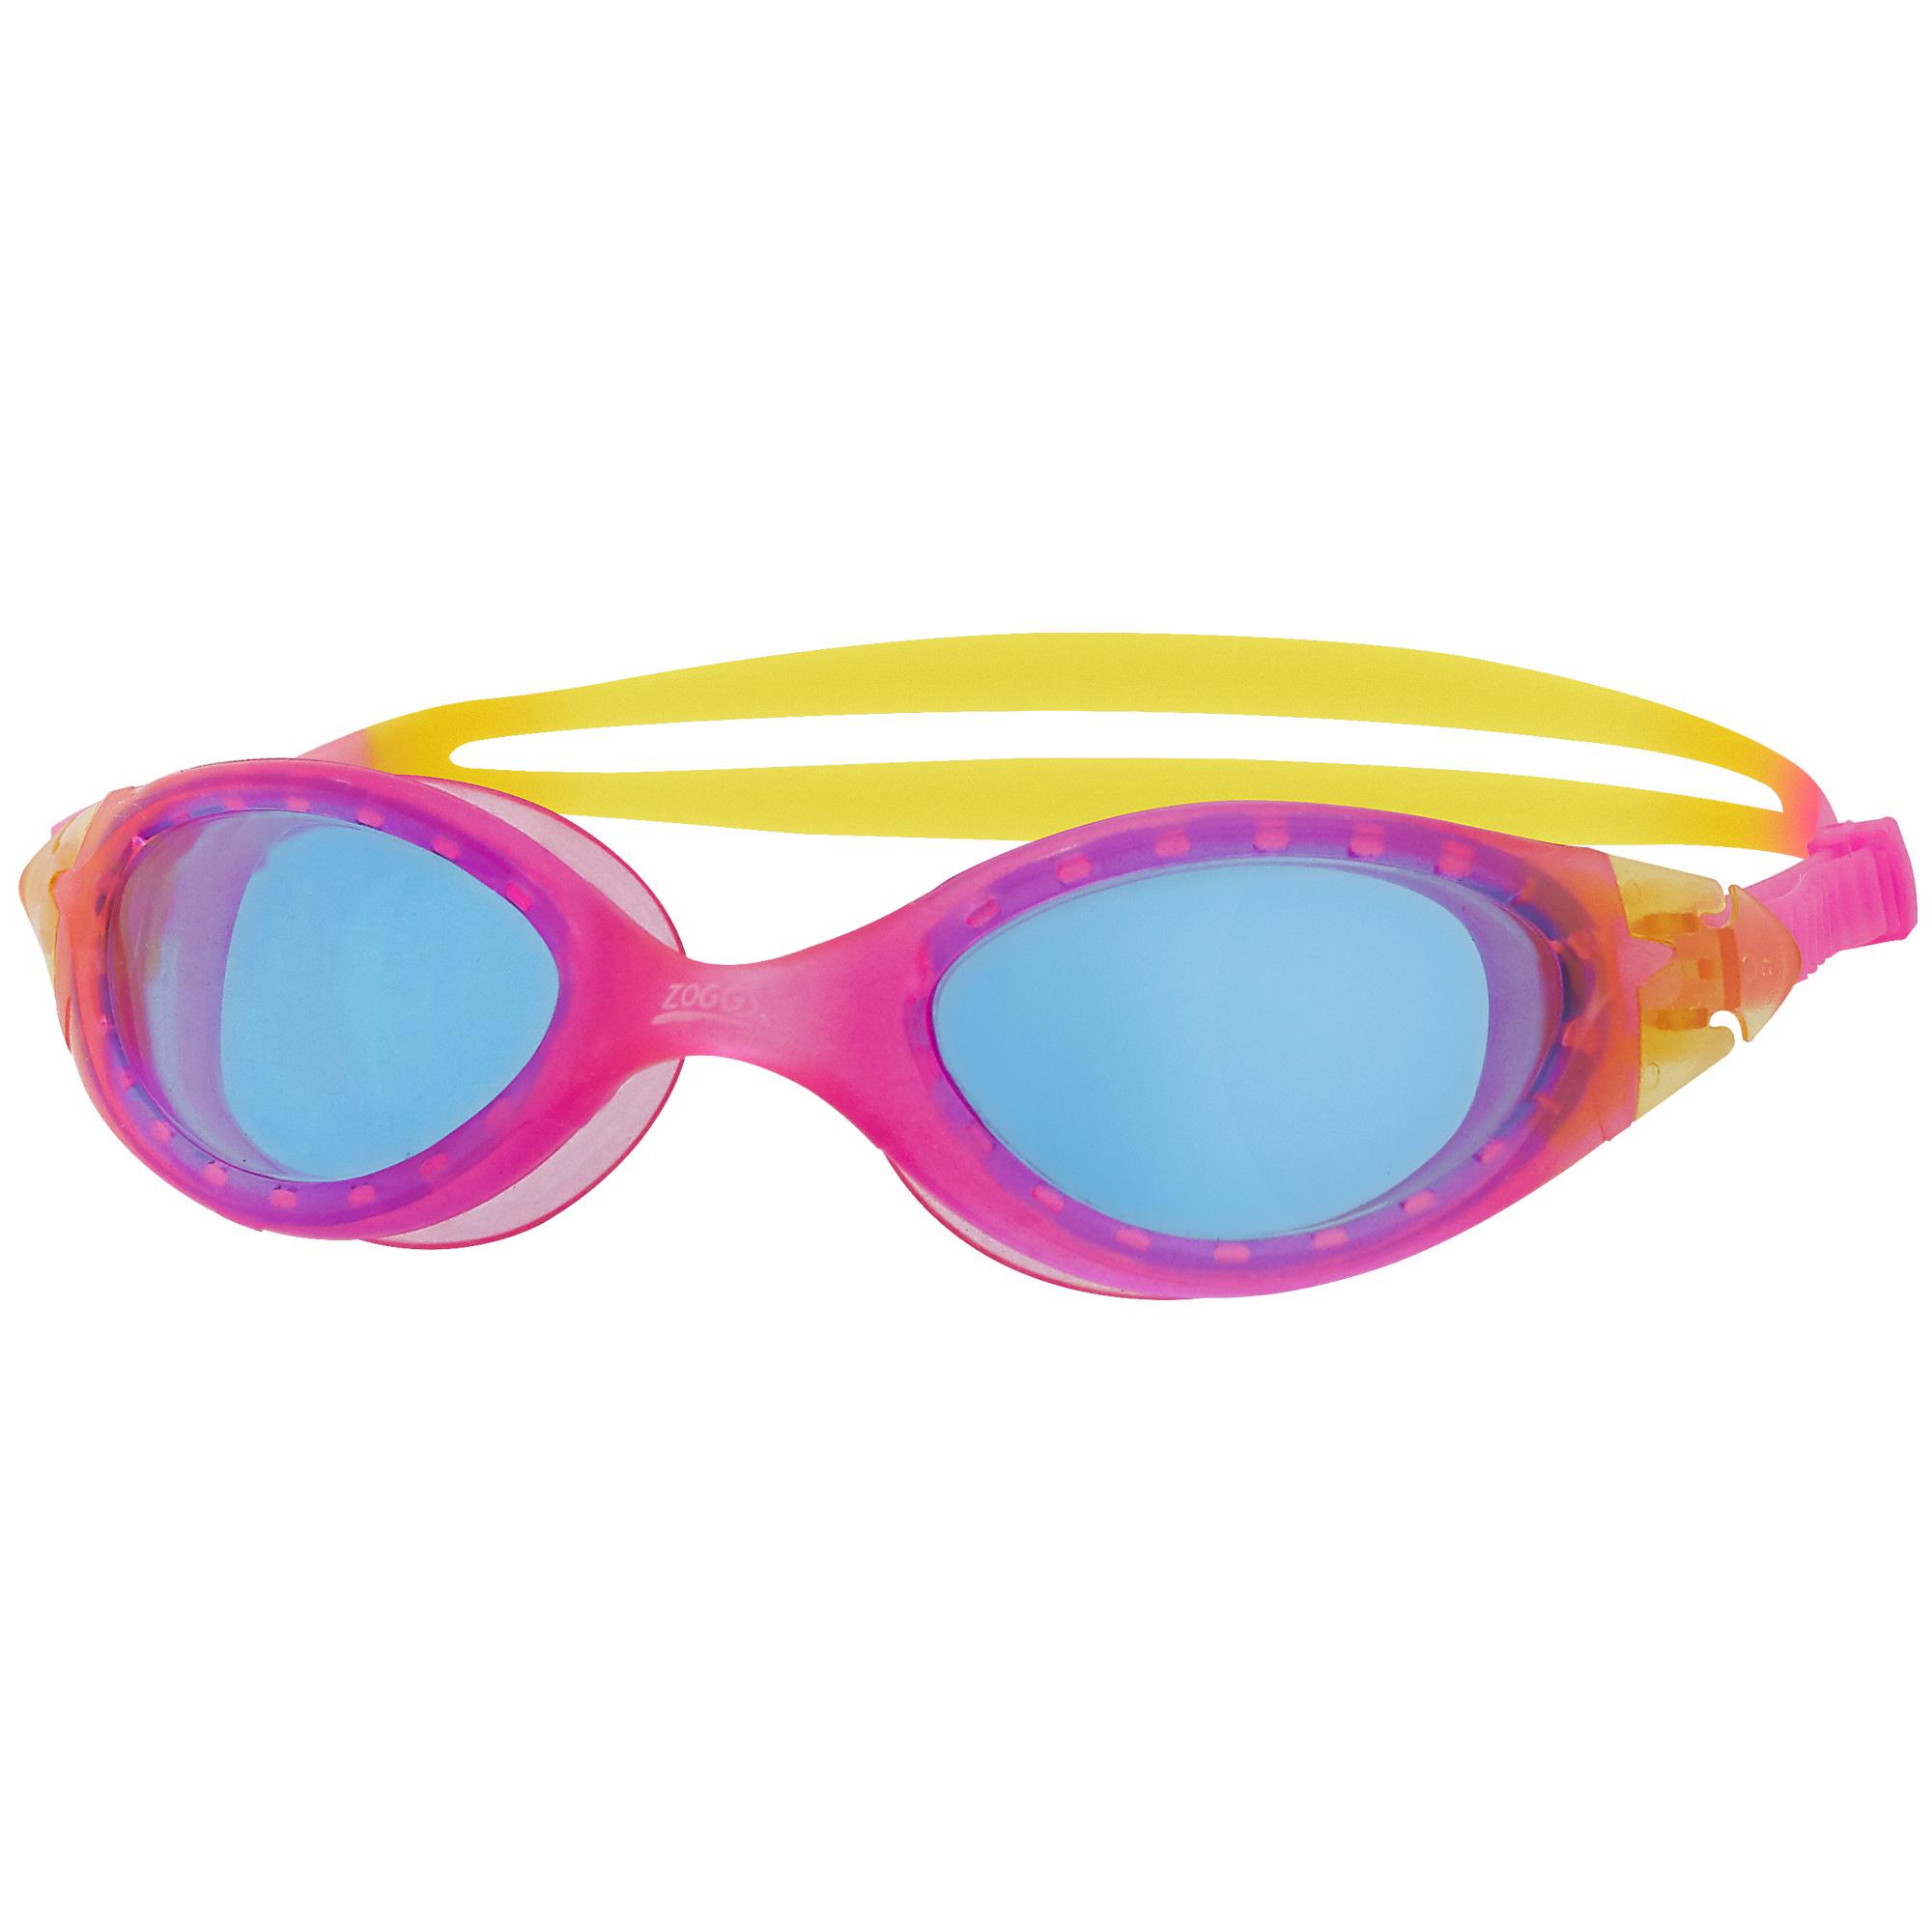 Zoggs Panorama Junior Swimming Goggles  Pink